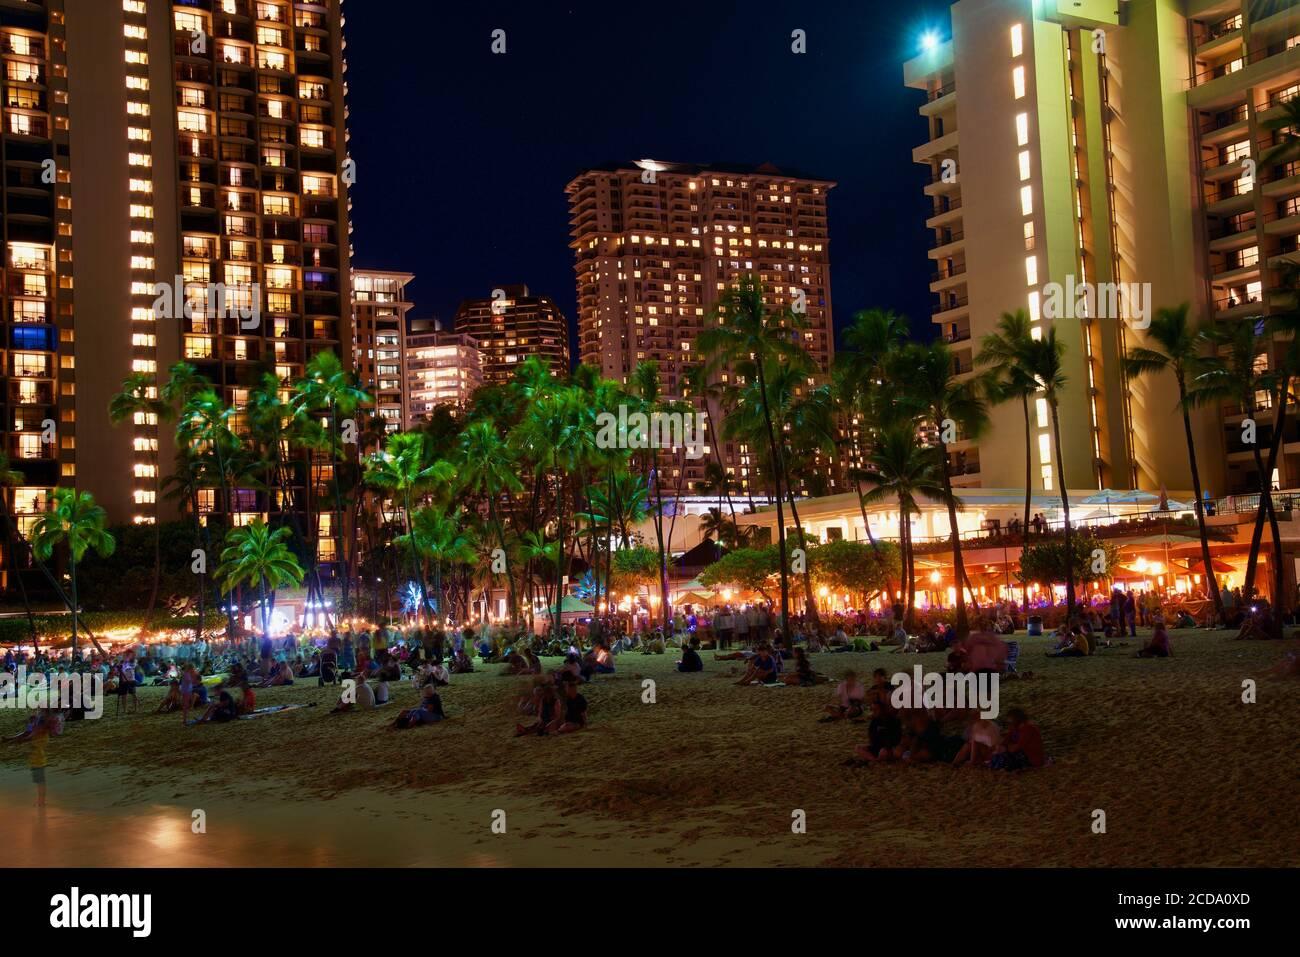 Crowds gathered to watch firework display over touristy beach, in front of hotel high rises, Waikiki Beach, Oahu Island, Honolulu, Hawaii, USA Stock Photo